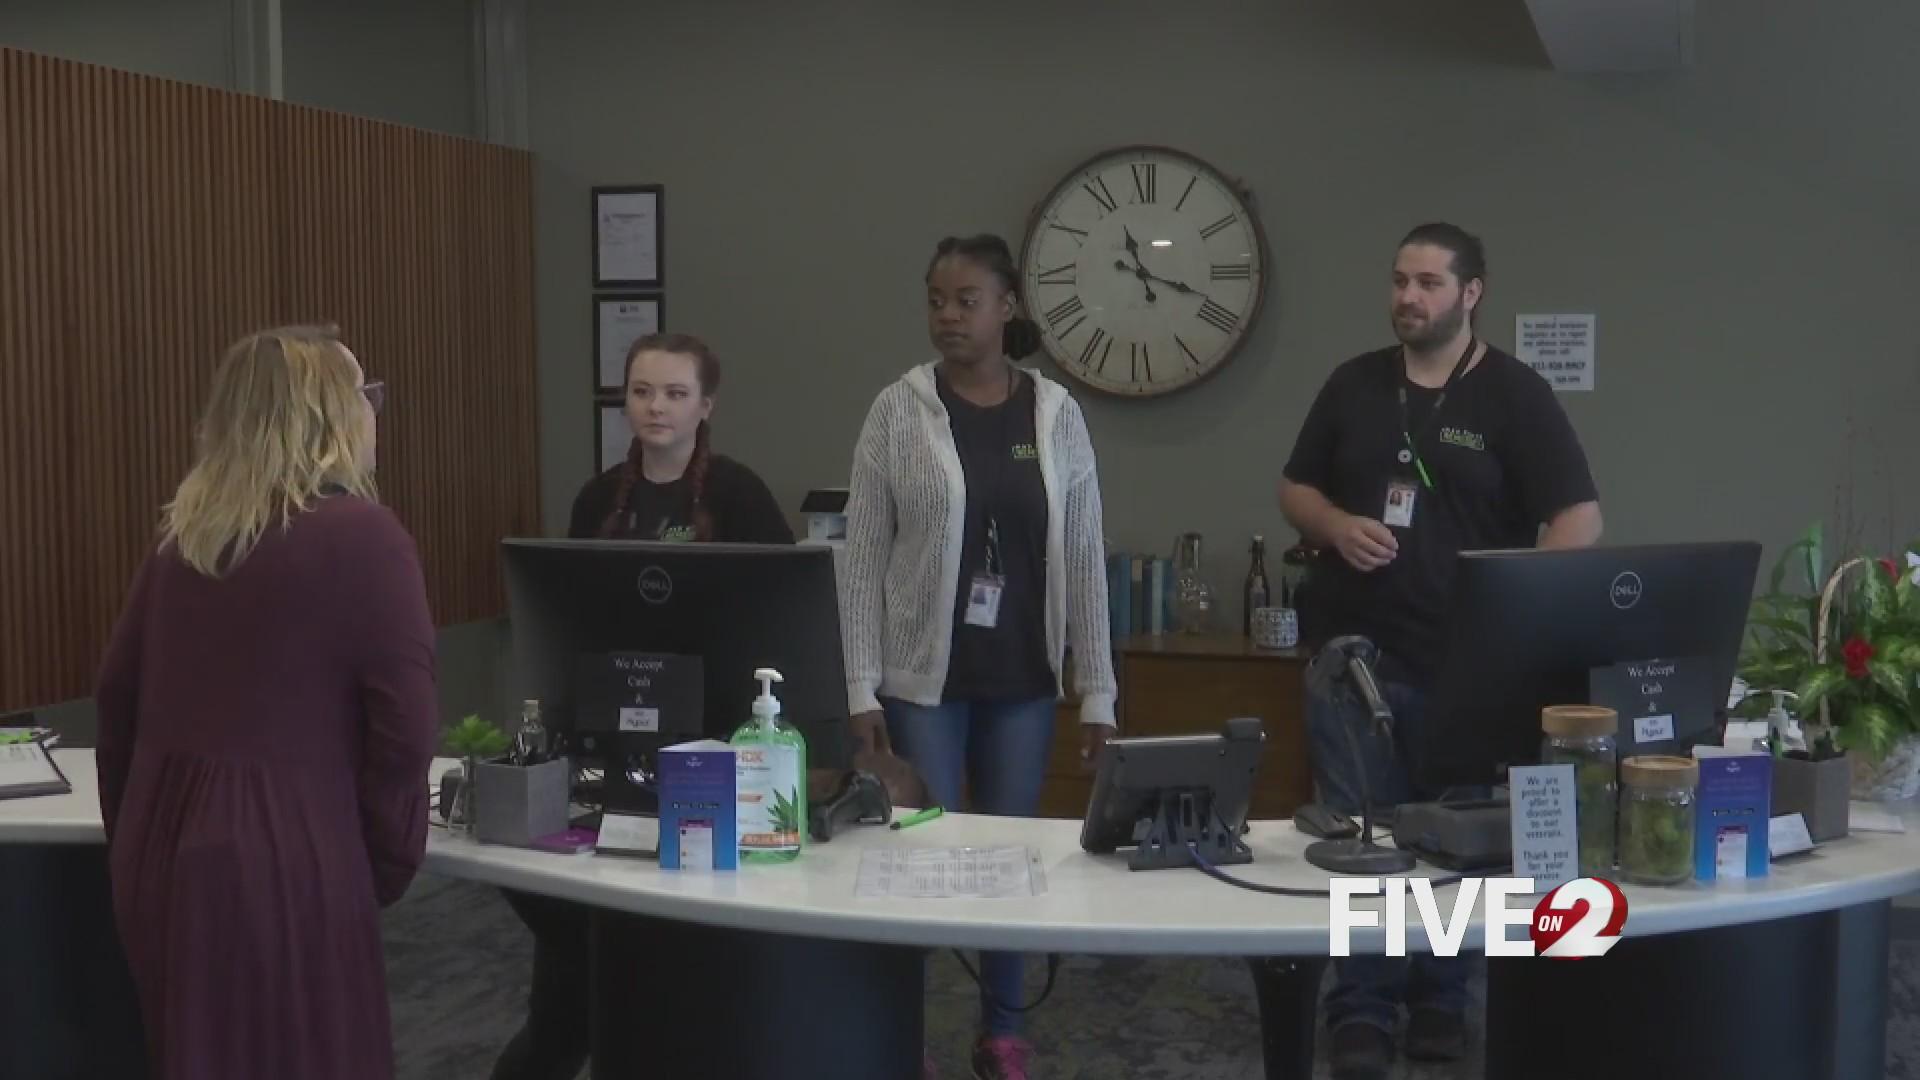 Police raid Dayton home, find drugs and guns